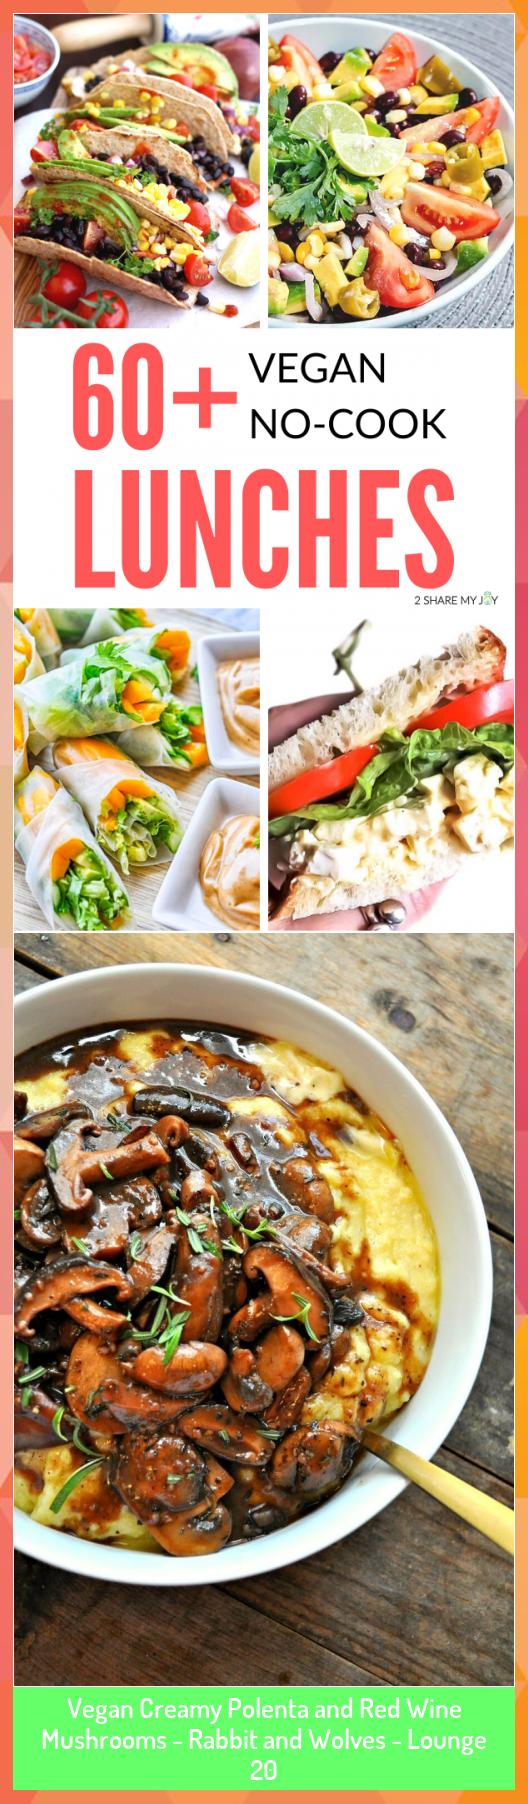 Vegan Creamy Polenta and Red Wine Mushrooms - Rabbit and Wolves - Lounge 20 #Creamy #Lounge #Mushrooms #Polenta #Rabbit #Red #Vegan #Wine #Wolves